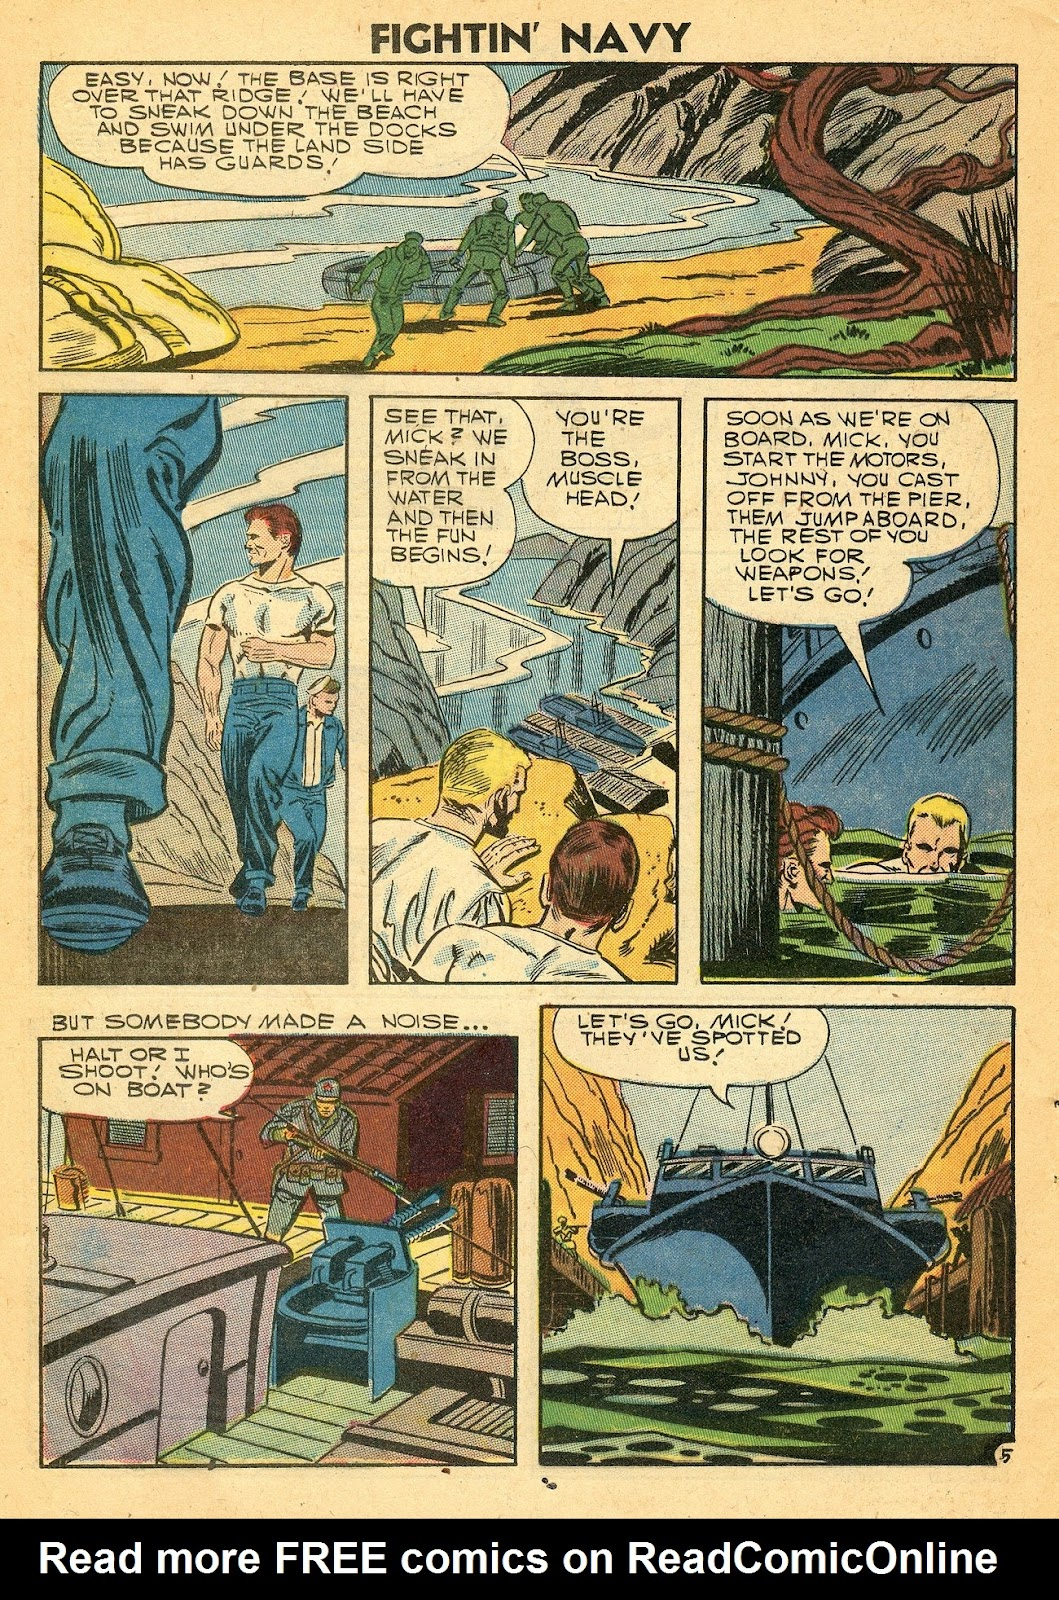 Read online Fightin' Navy comic -  Issue #77 - 24